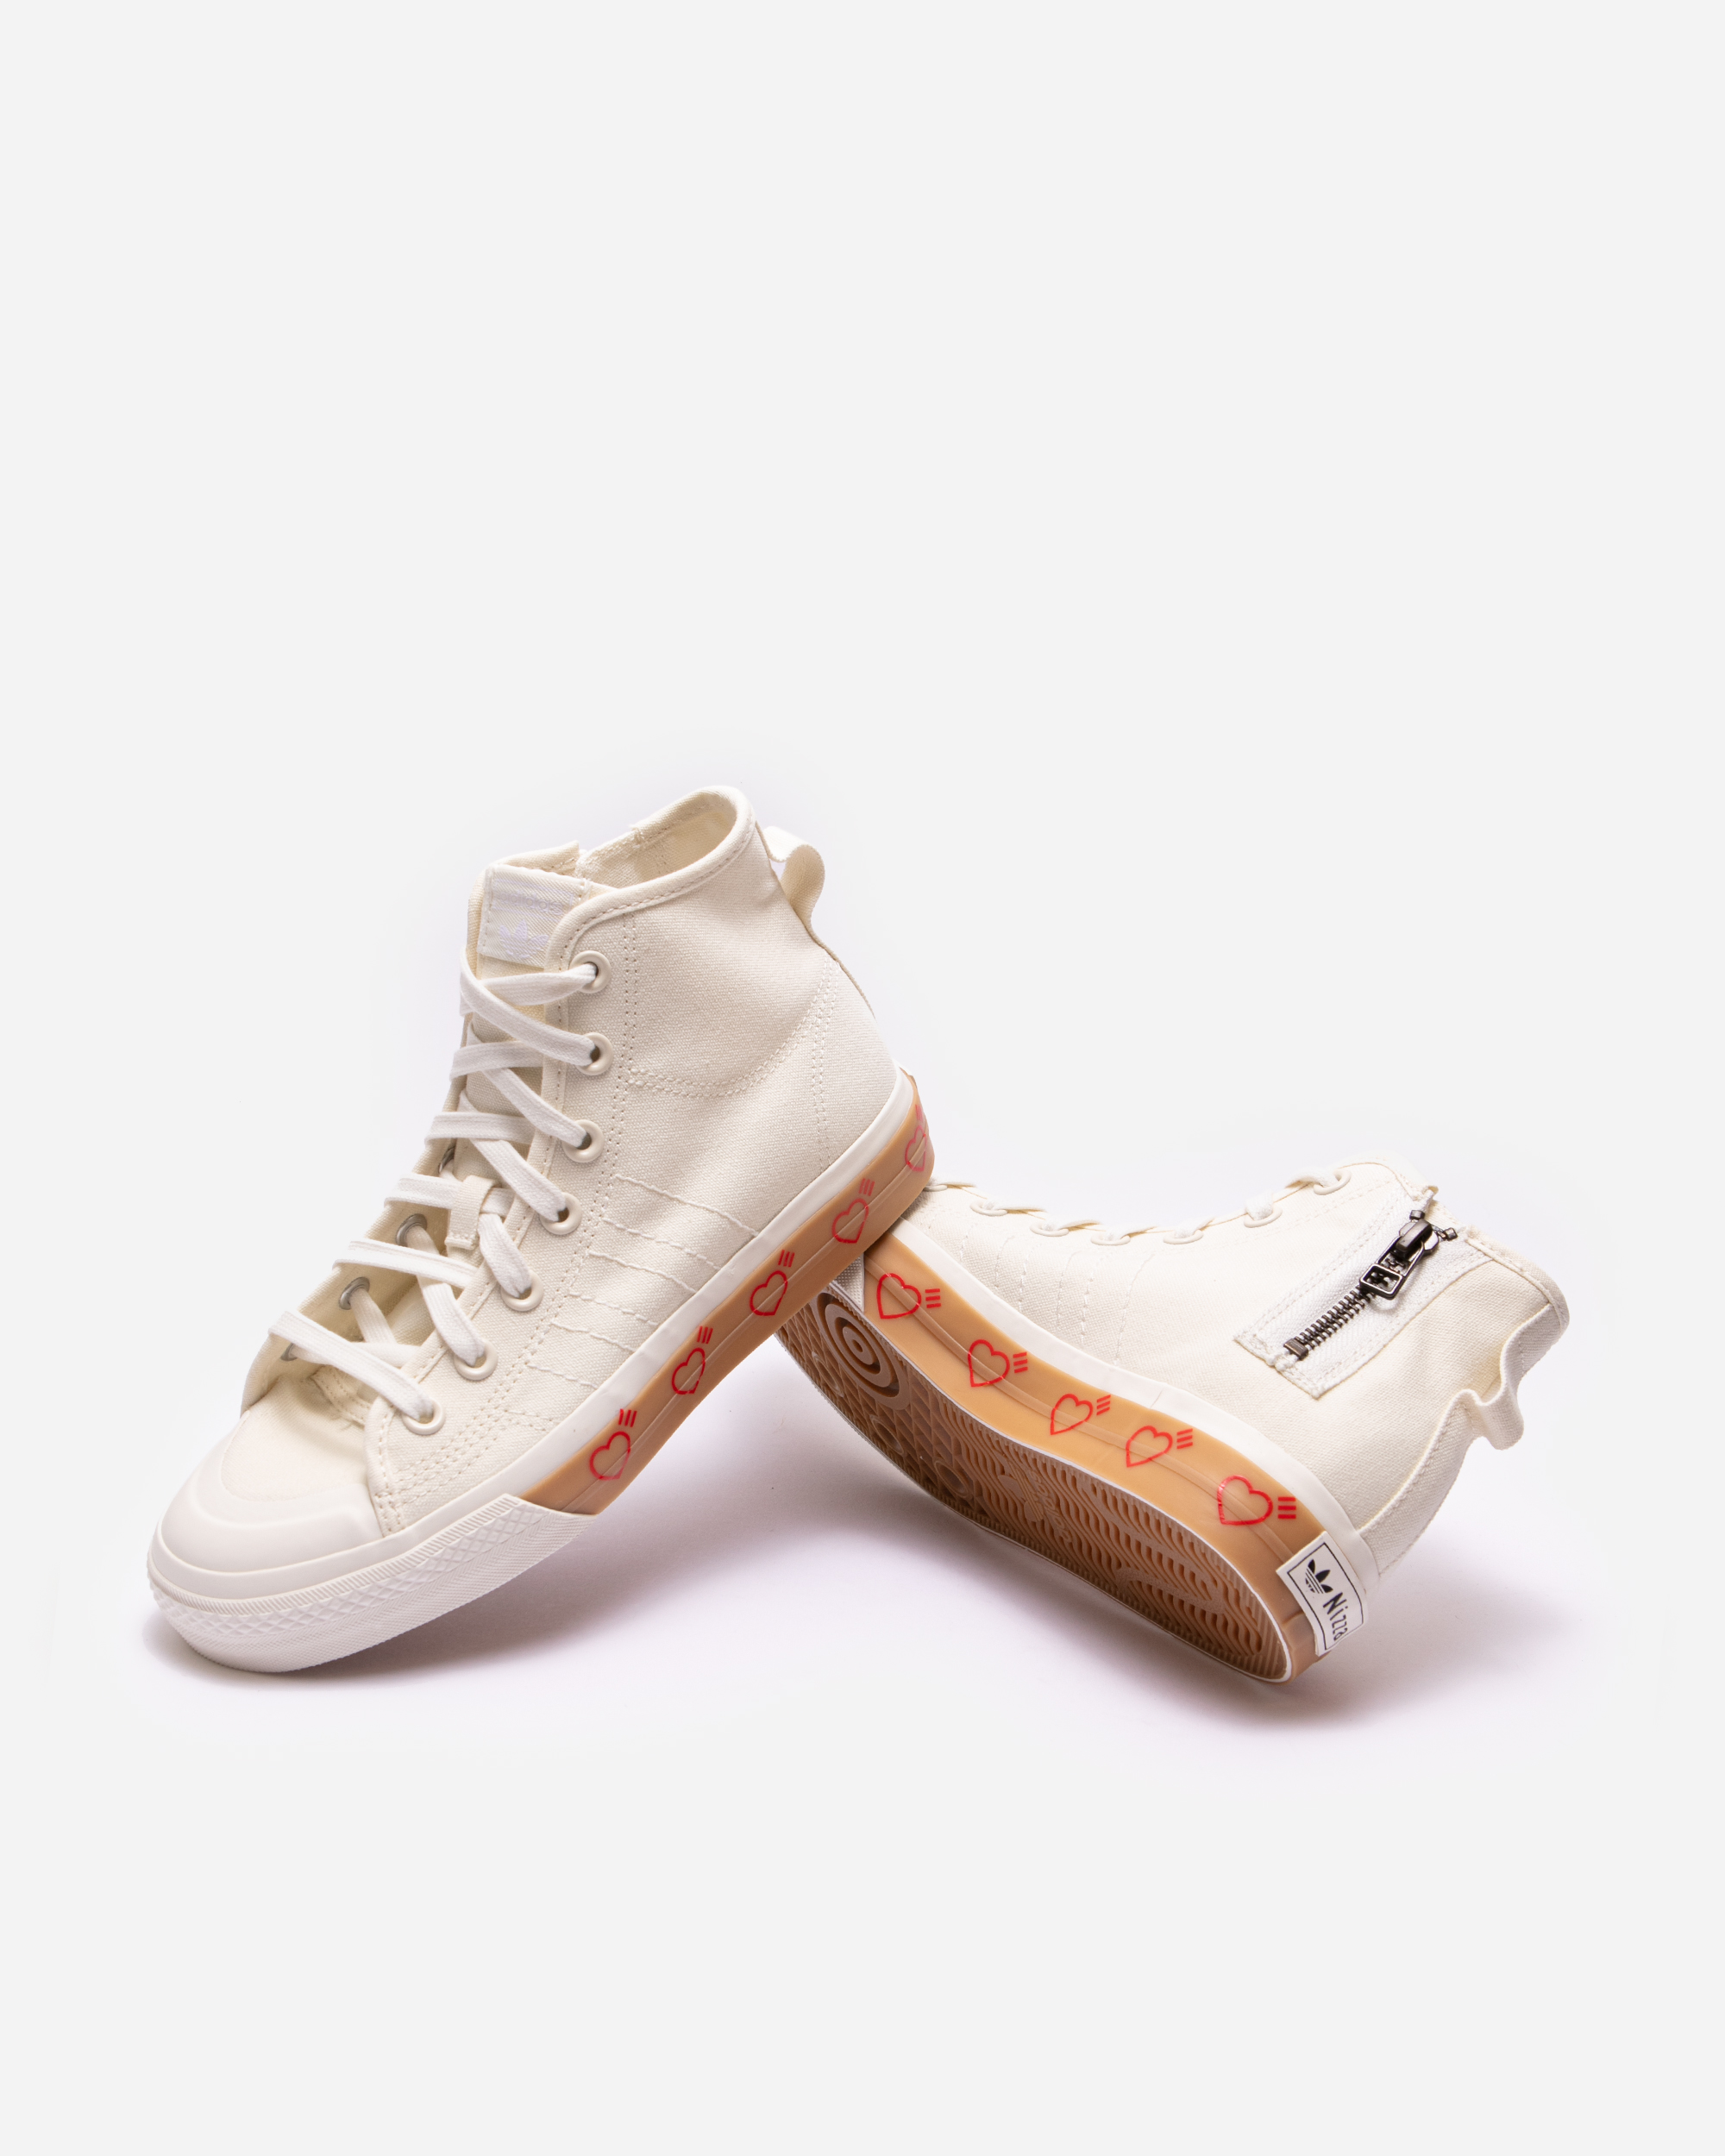 Adidas Originals Adidas Consortium x Human Made Nizza Hi Off White ...